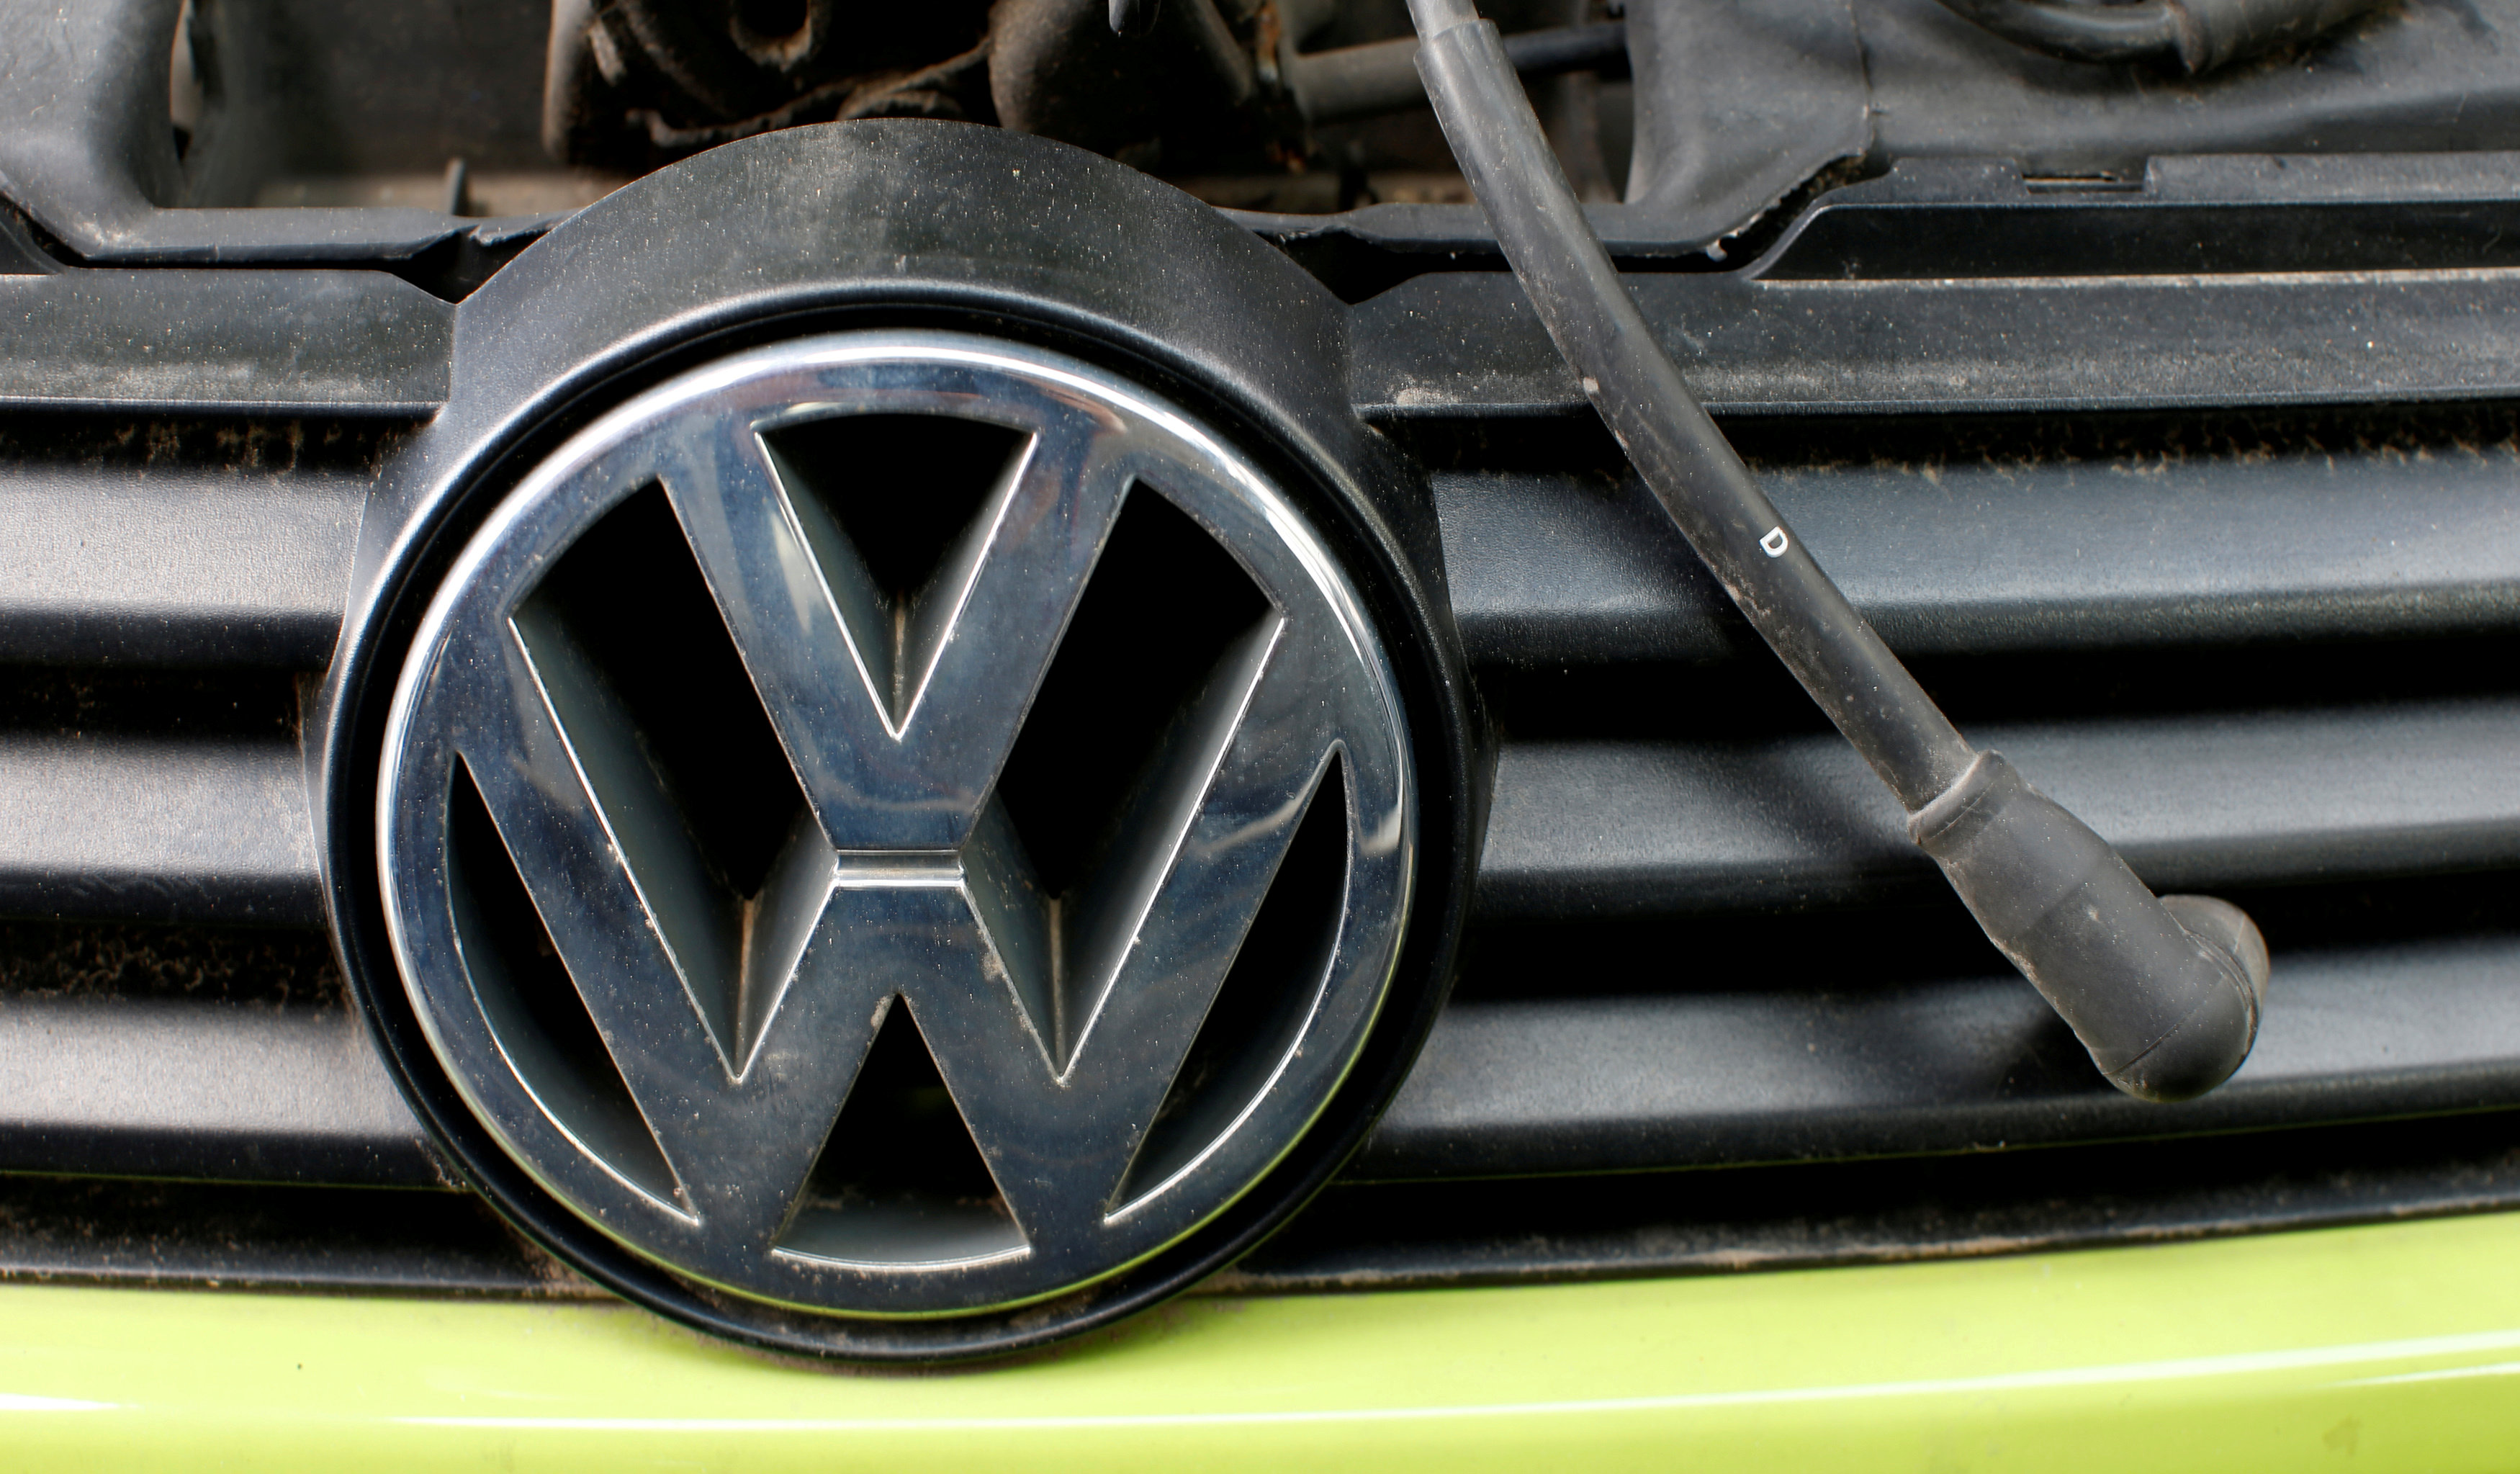 Volkswagen targets 3% share in Indian passenger vehicle market